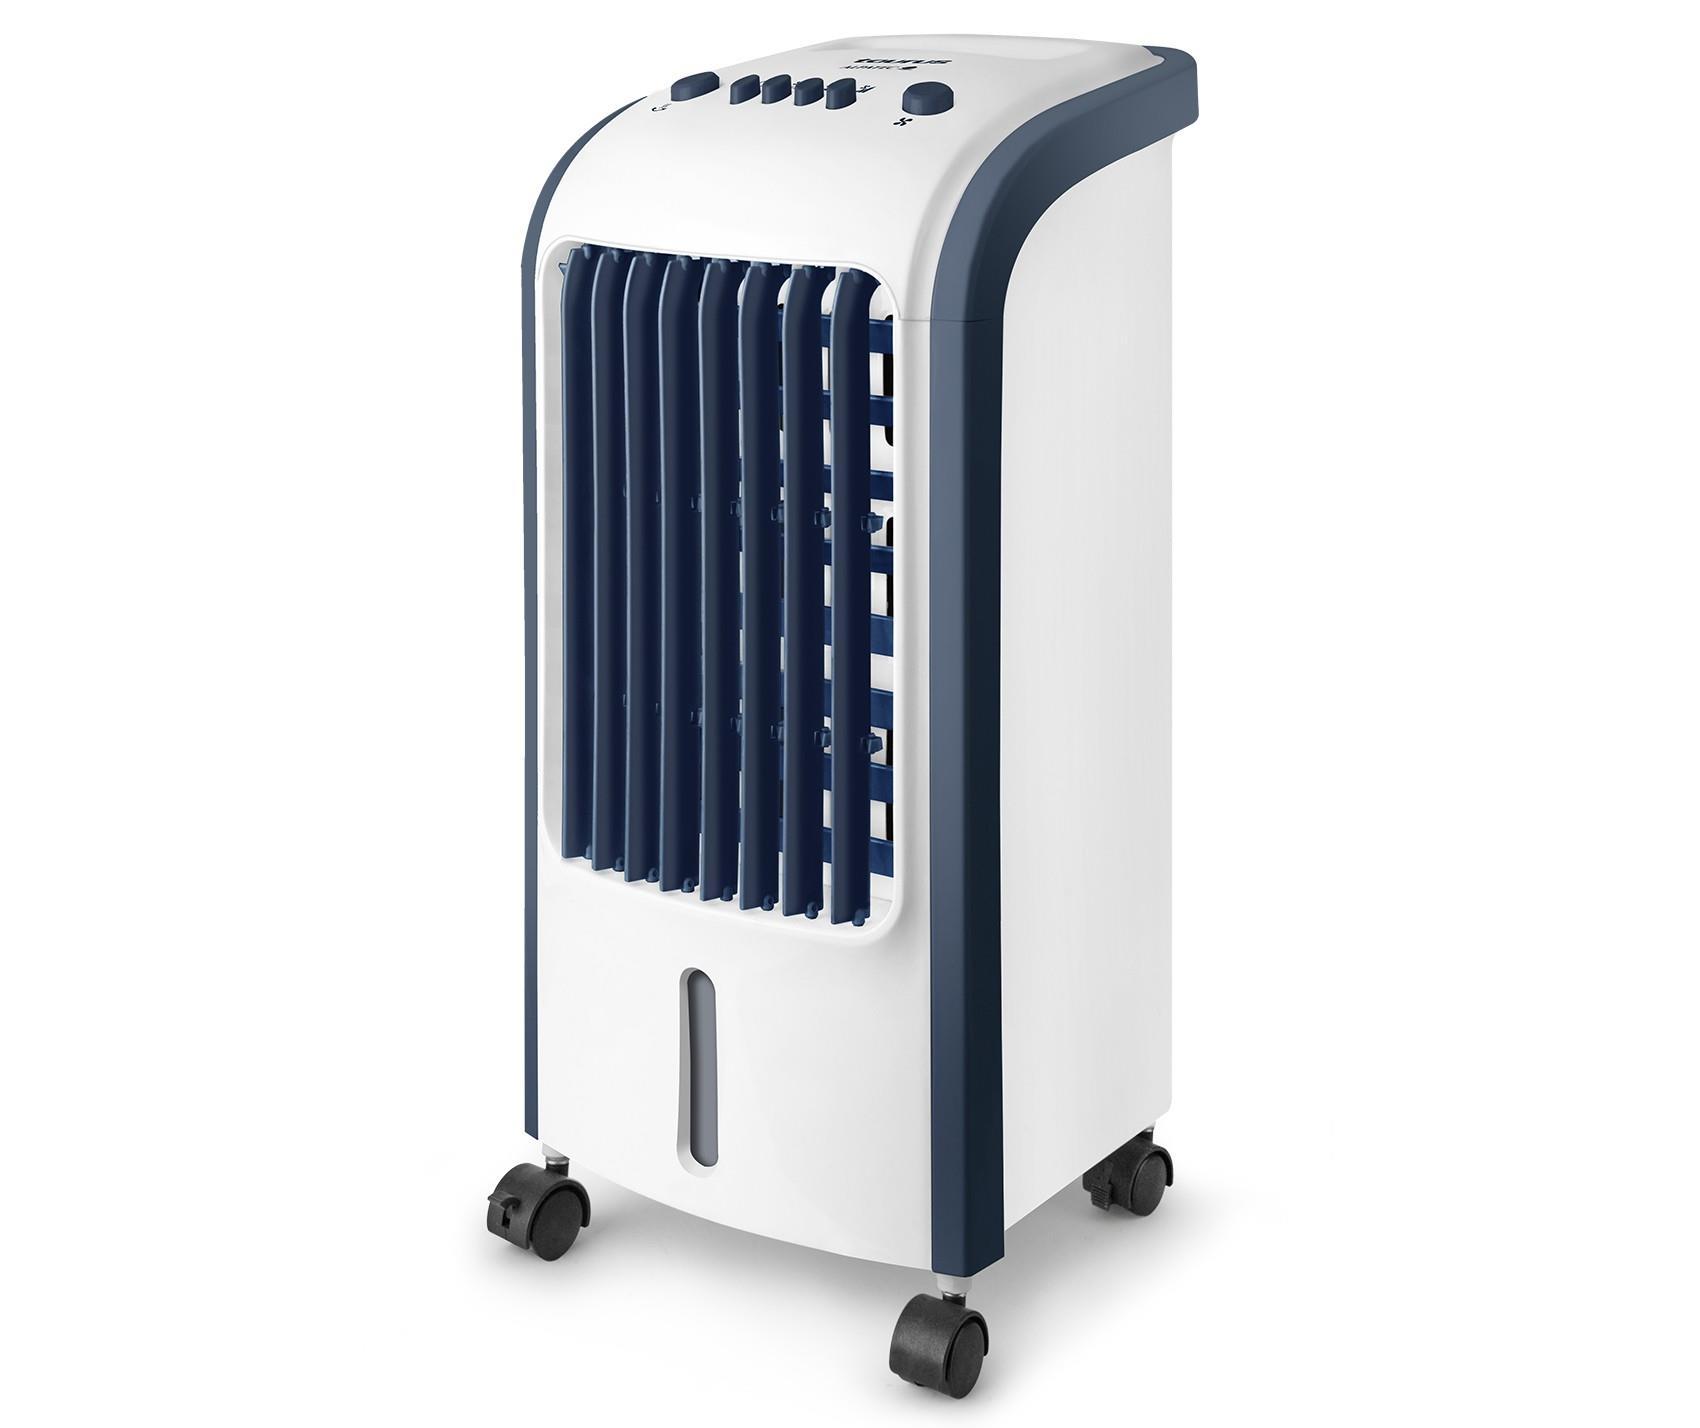 Ravanson TAURUS R500 R500 (80W; blue and white color) Klimata iekārta